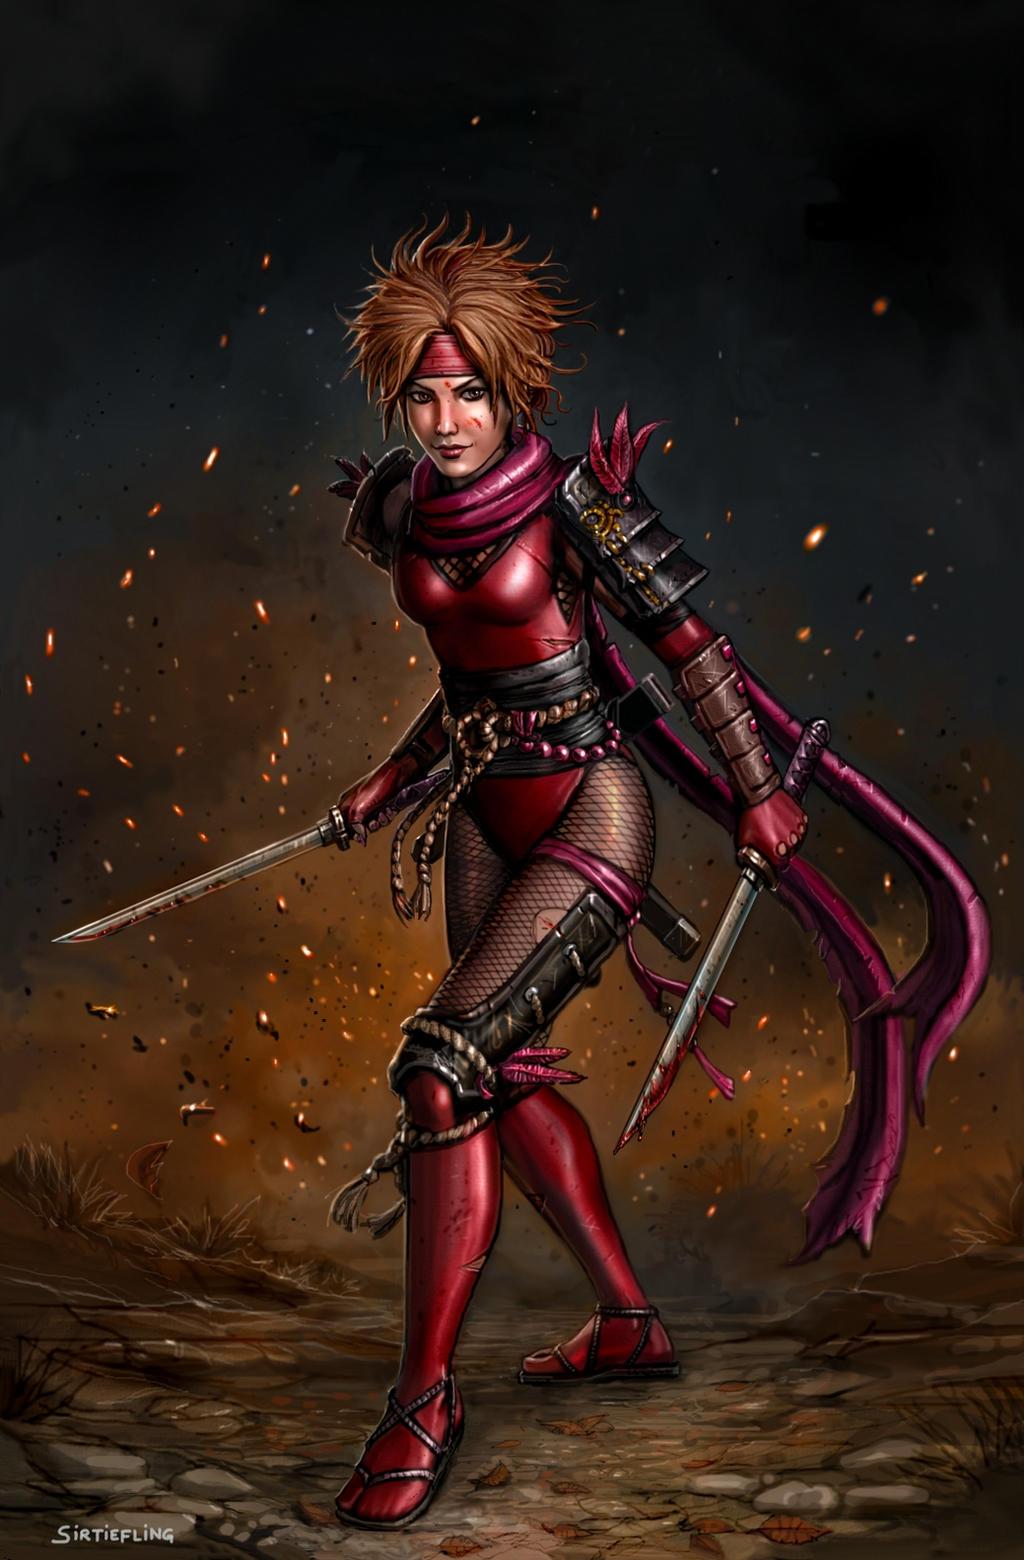 natsu the vexatious ninja by sirtiefling on deviantart